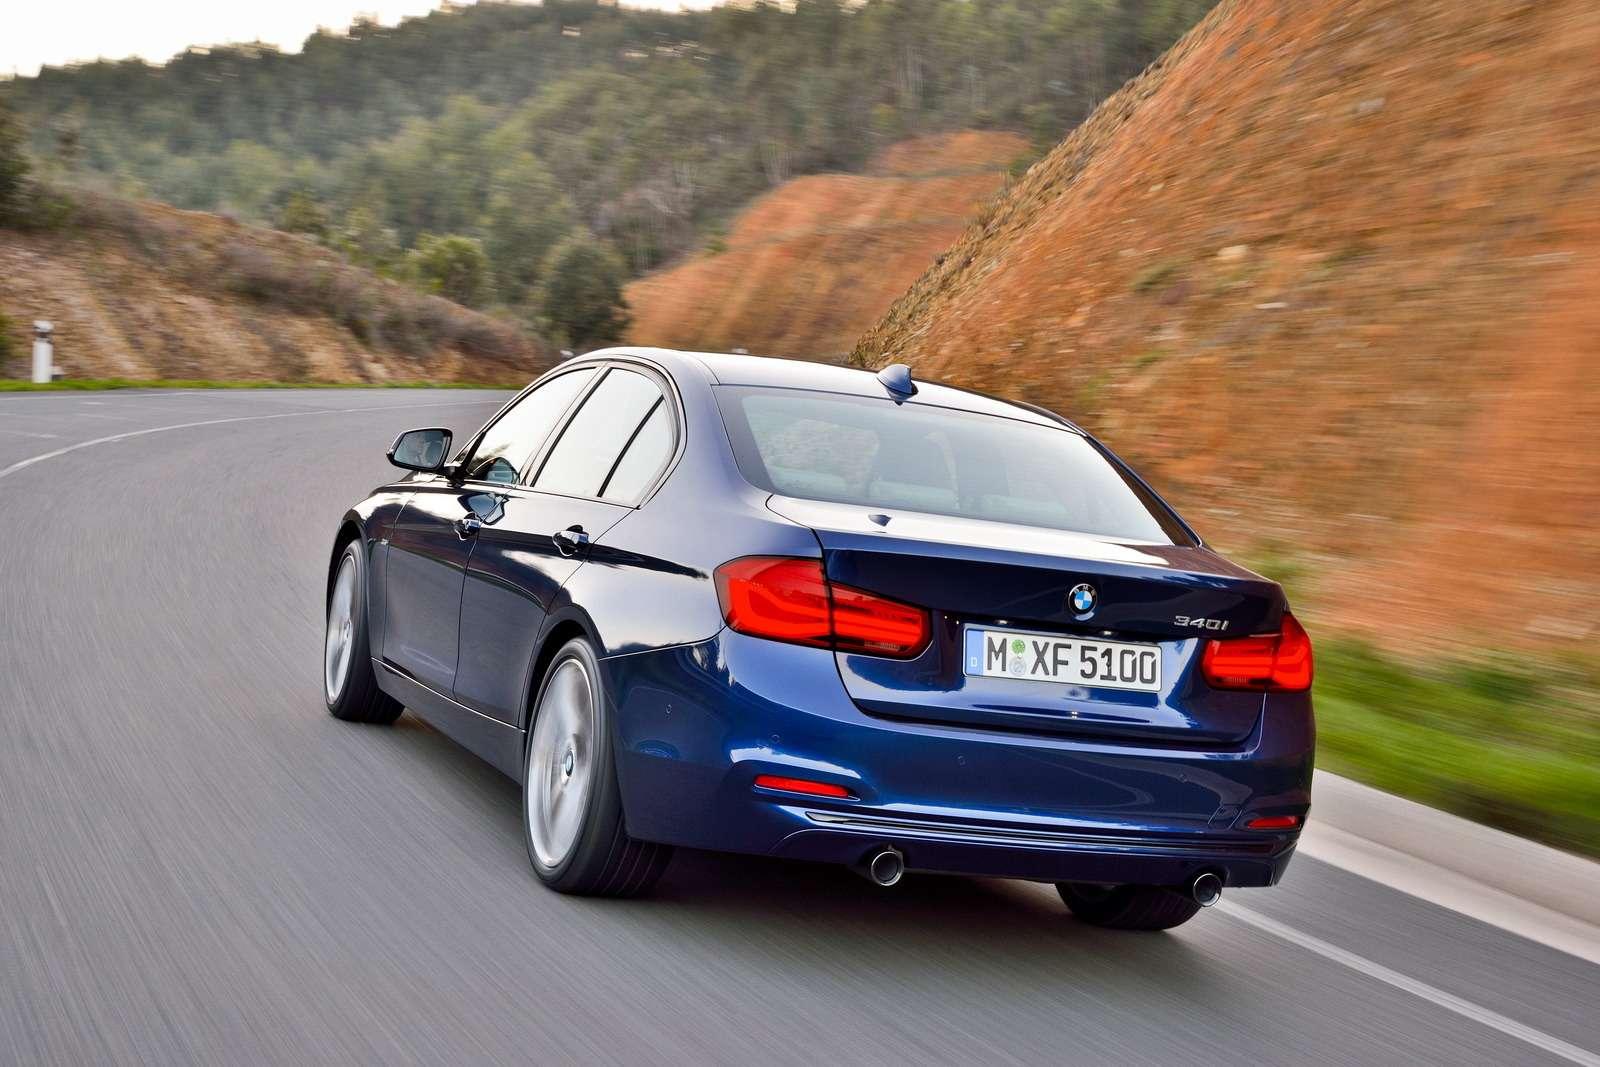 01BMWX1-BMW3 zr09-15_новый размер